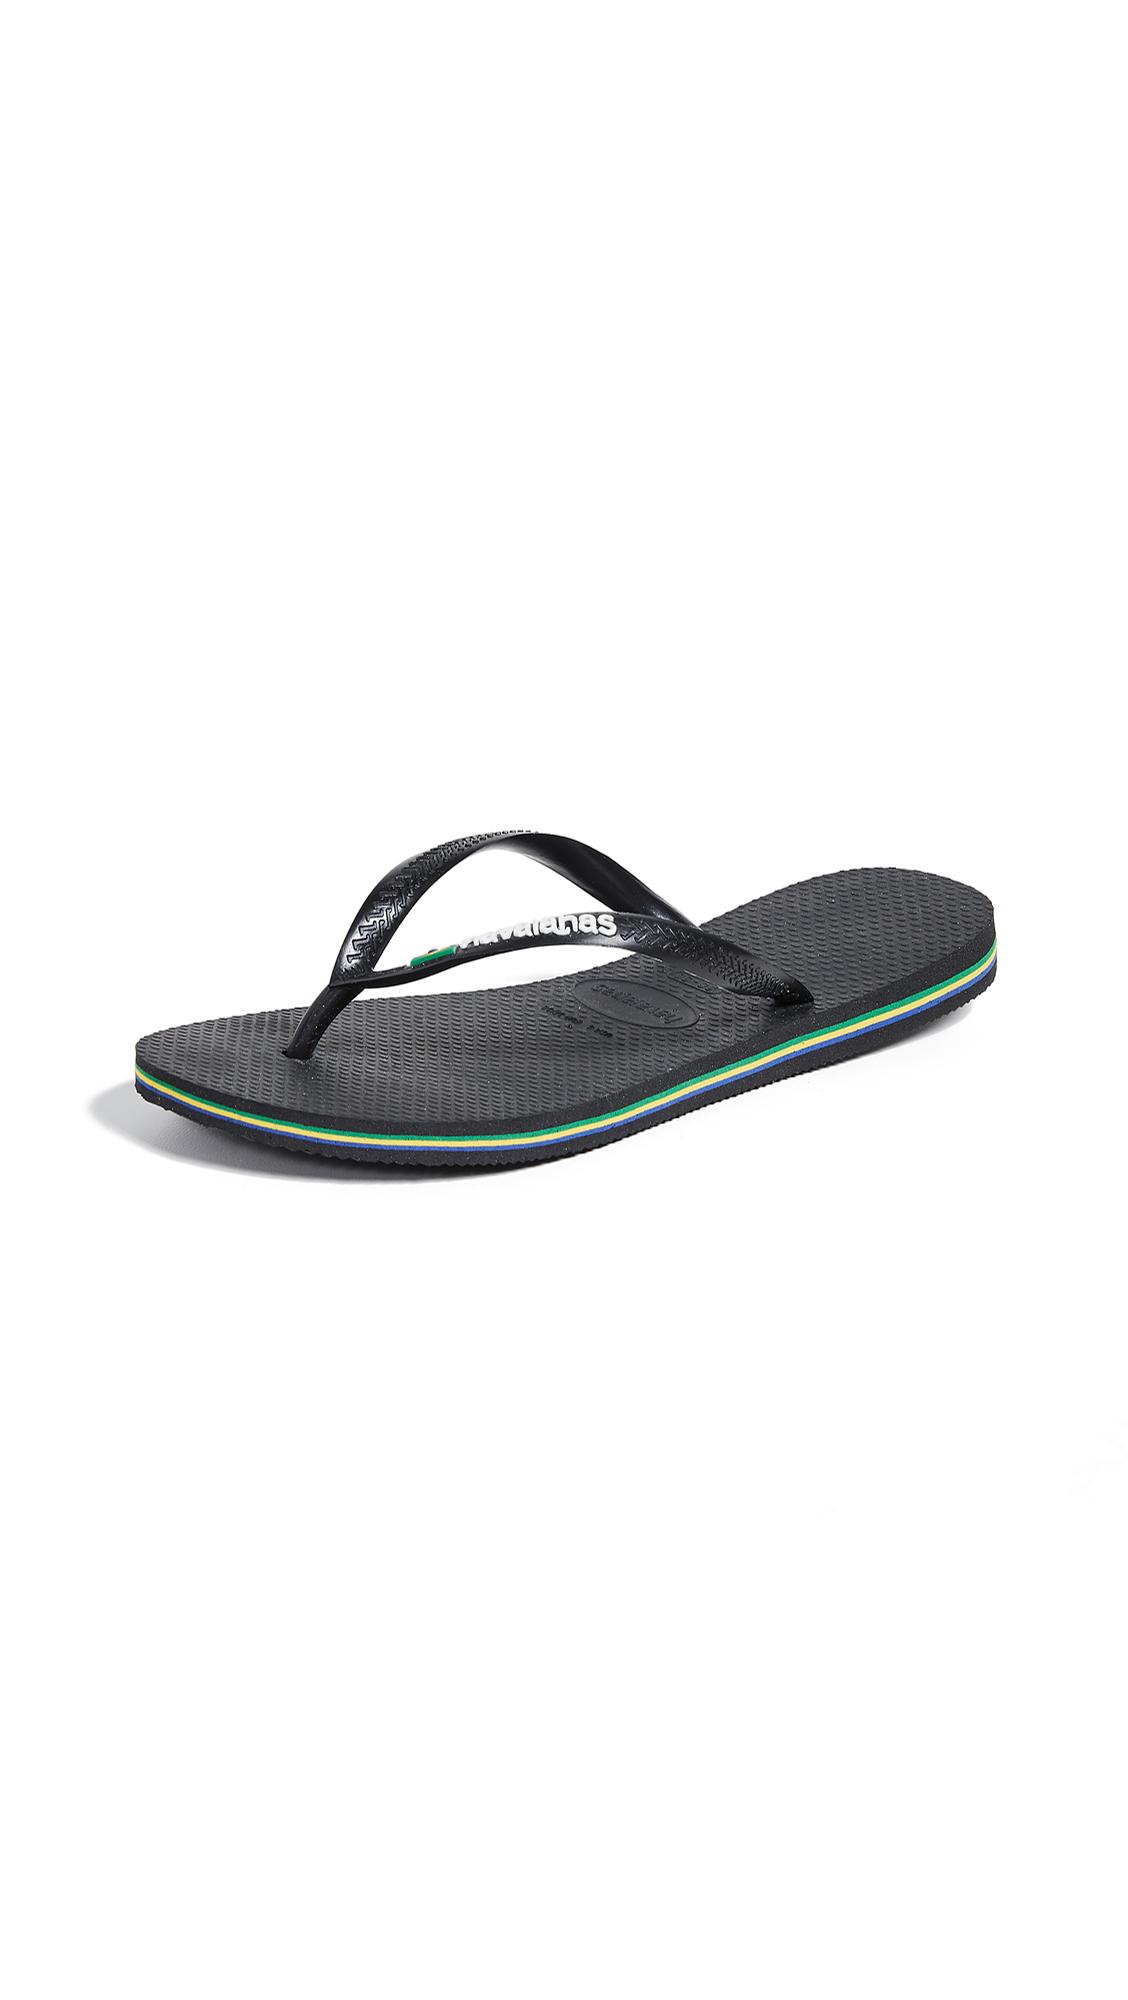 Havaianas Slim Brazil Flip Flops - Black